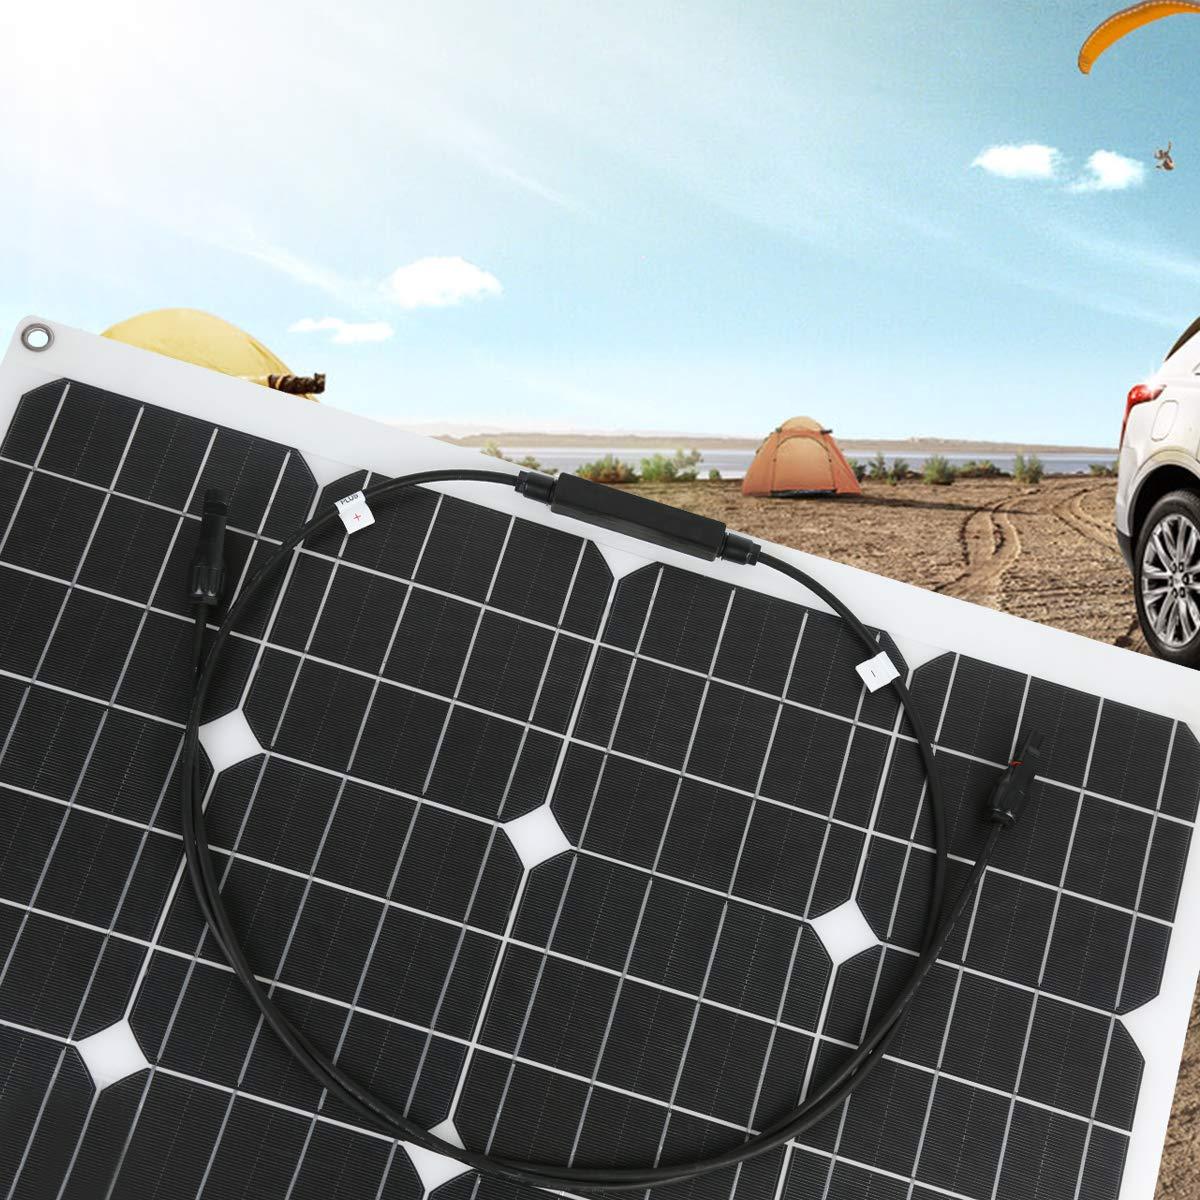 Car 12v Battery or any Other Irregular Surface Tent Betop-camp 50W Flex Semi-Flexible Monocrystalline PV Solar Panel for RV Trailer Boat